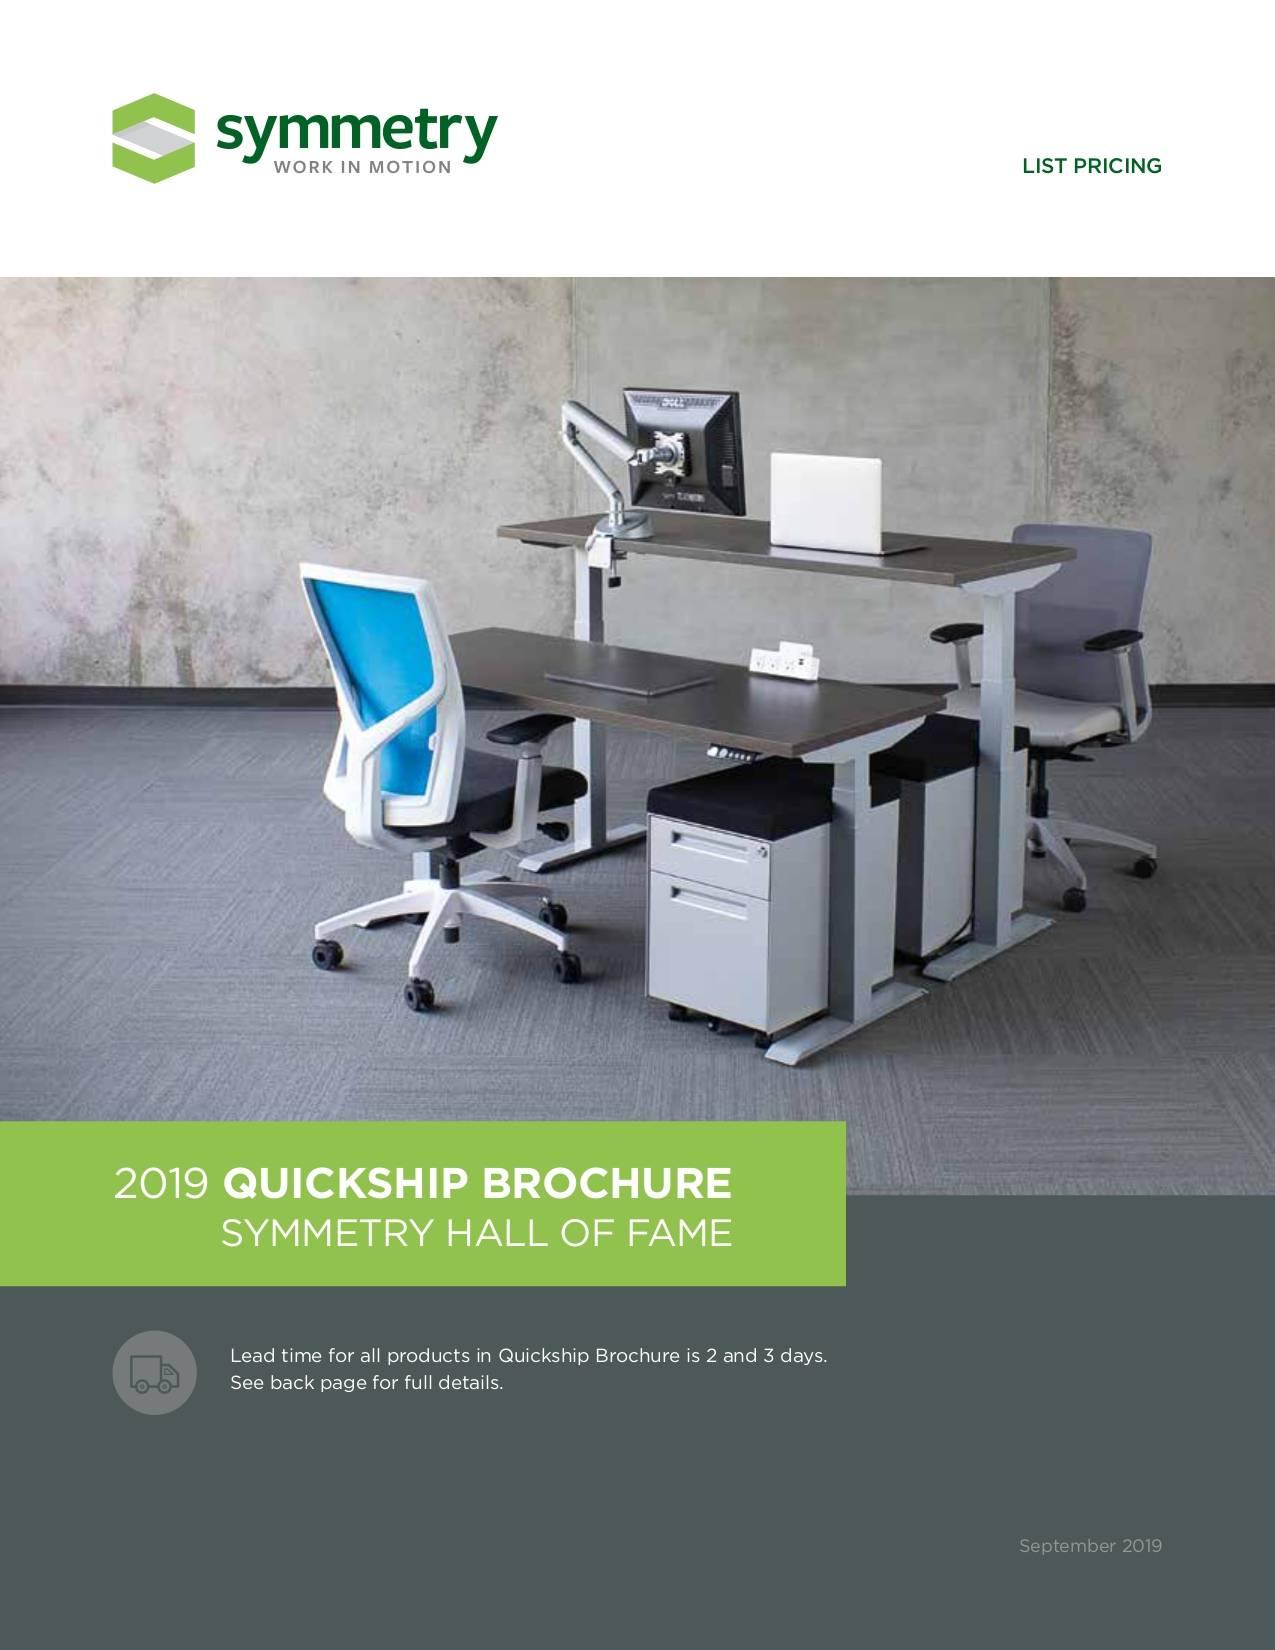 Symmetry Furniture Quickship Brochure